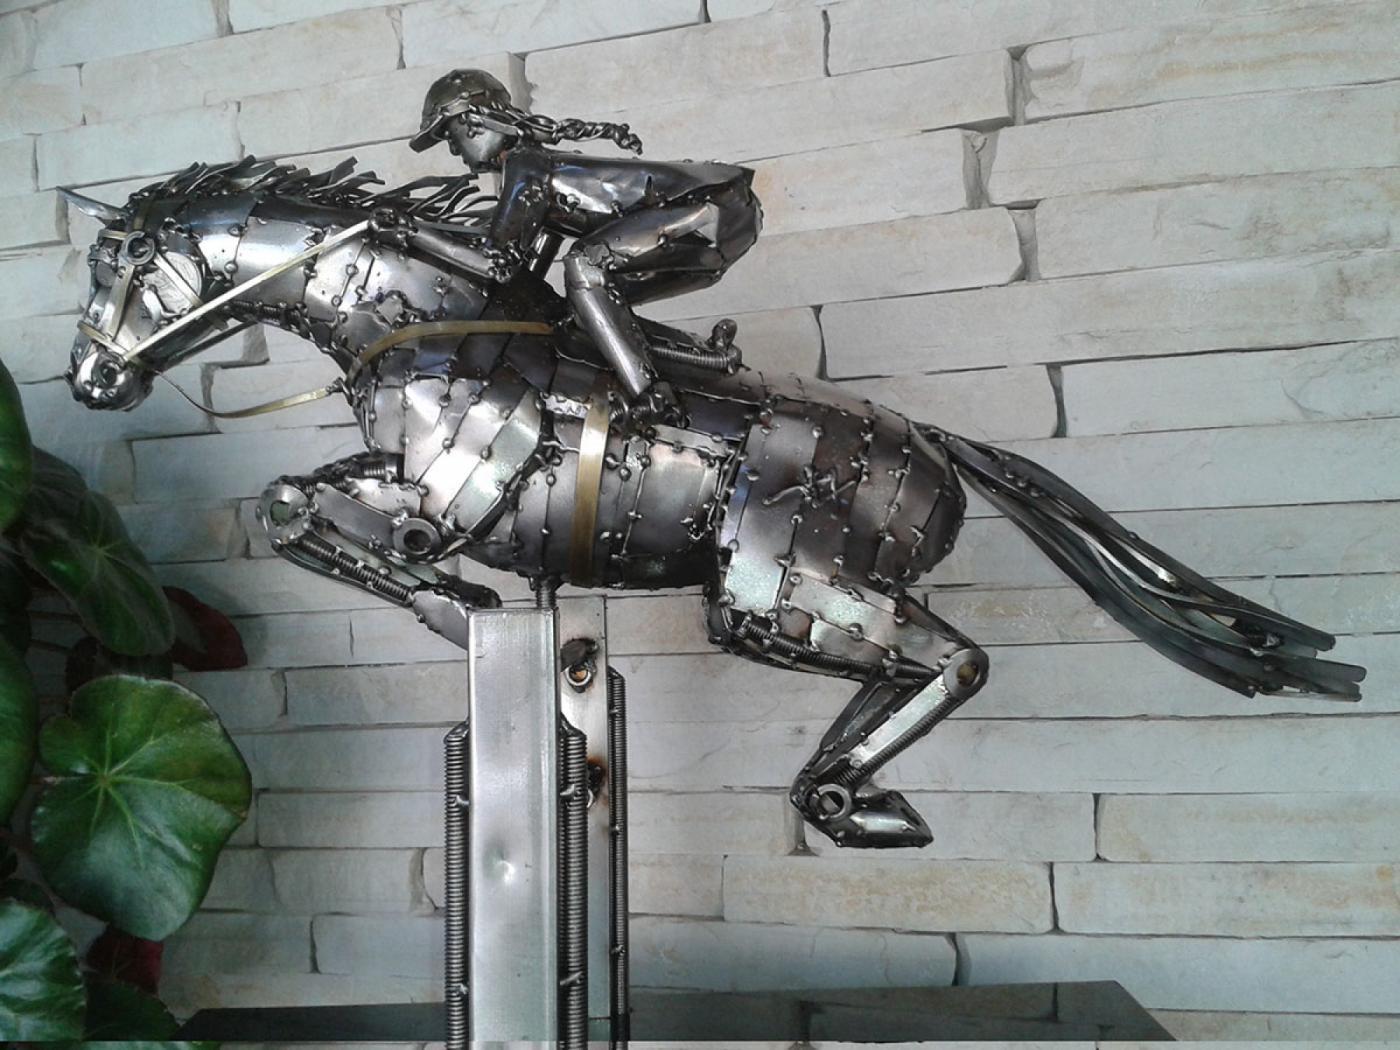 Mini Escultura Hipismo – Patas no Ar - À V ENDA Ze Vasconcellos Metal SculpturesZe Vasconcellos Metal Sculptures - Metal Sculptures - Campinas - São Paulo - Brasil Esculturas em Metal, Metal Sculptures, Cavalo Metal, Horse Metal, Art Metal, Ze Vasconcellos Metal Sculptures